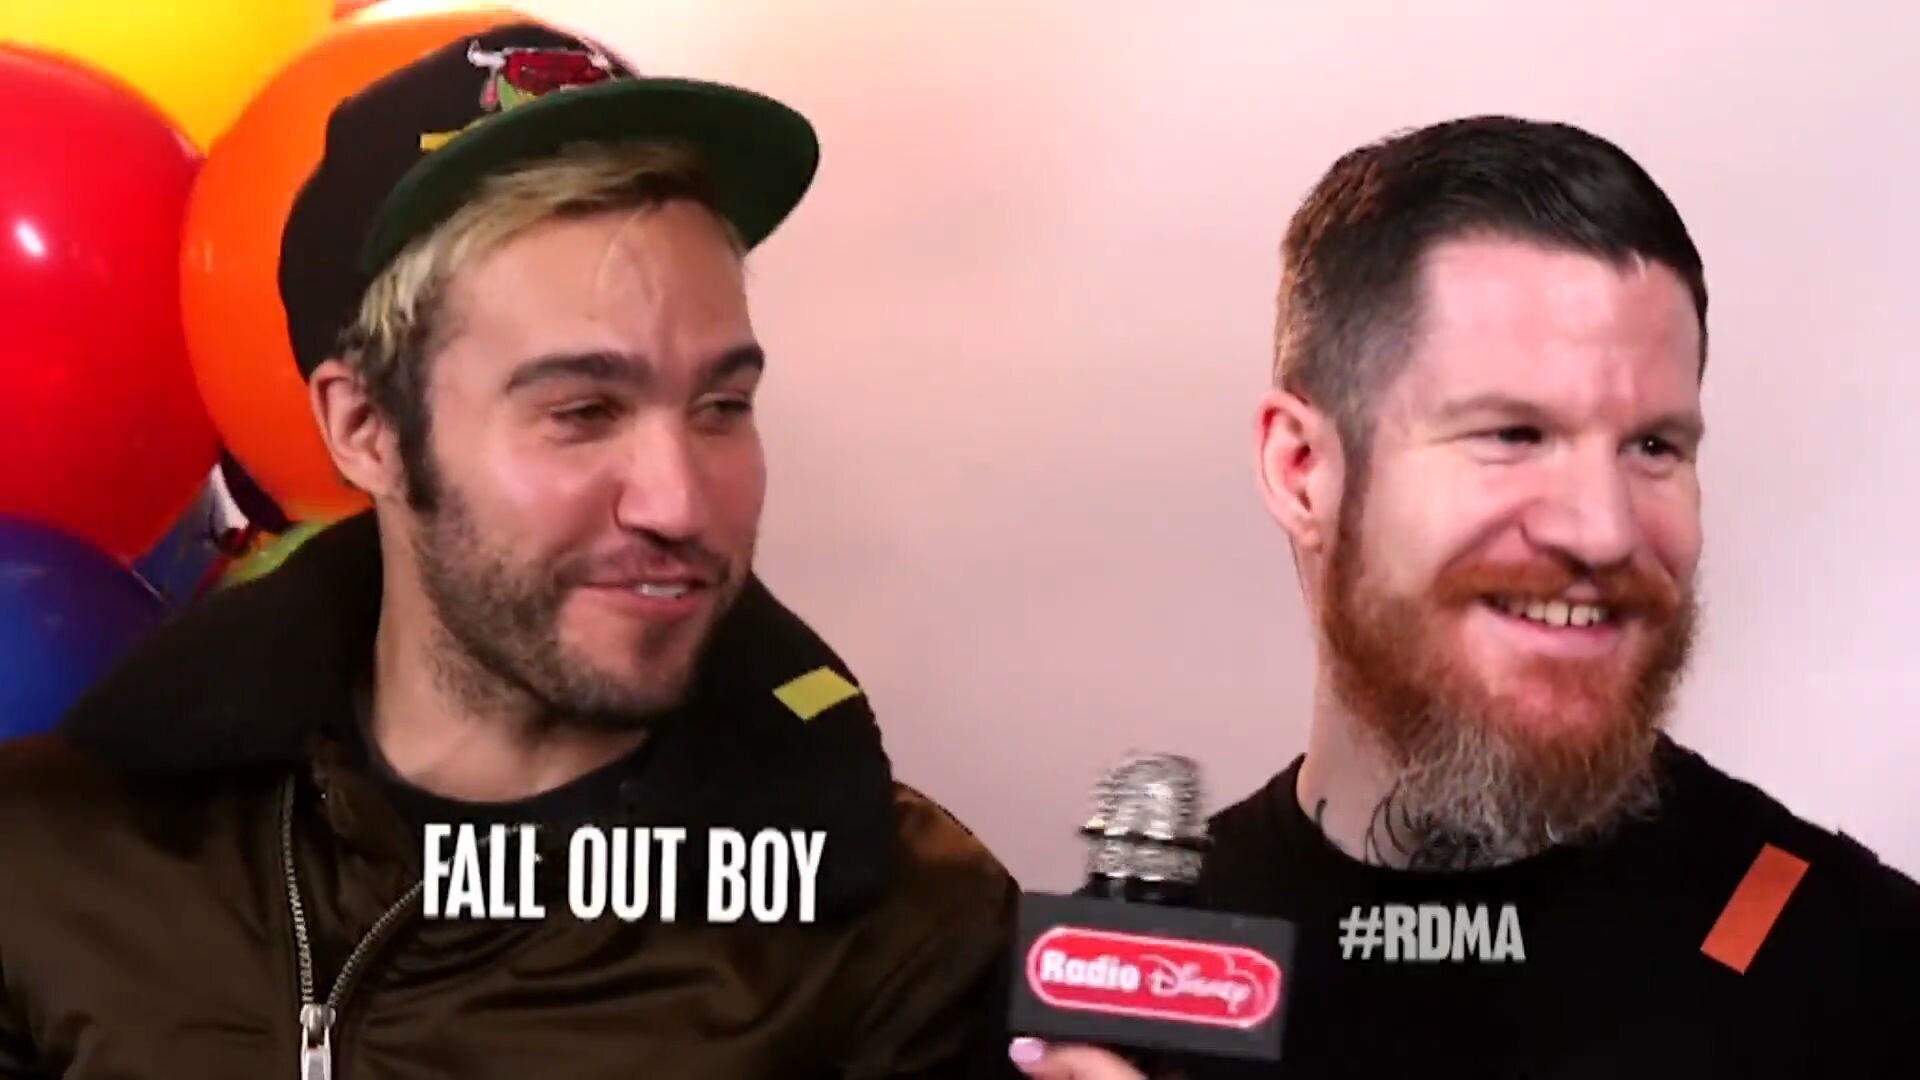 RDMA 2016 | ผู้ถูกเสนอชื่อเข้าชิง Fall Out Boy